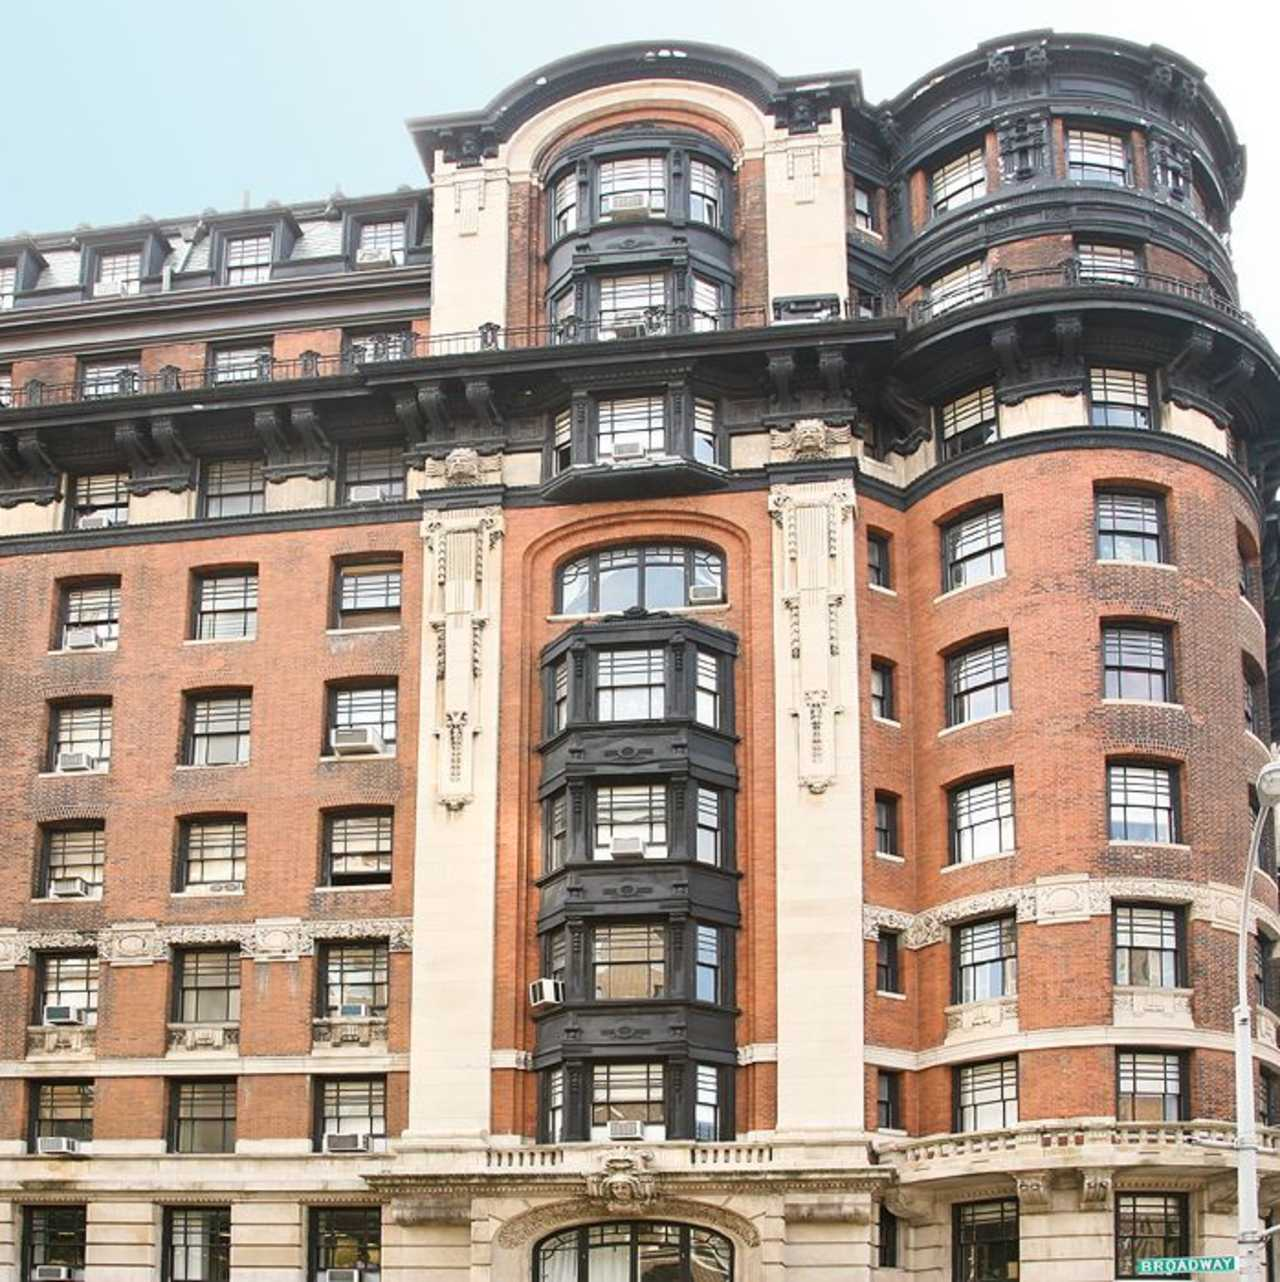 Hotel New York Hotel Belleclaire Canusa